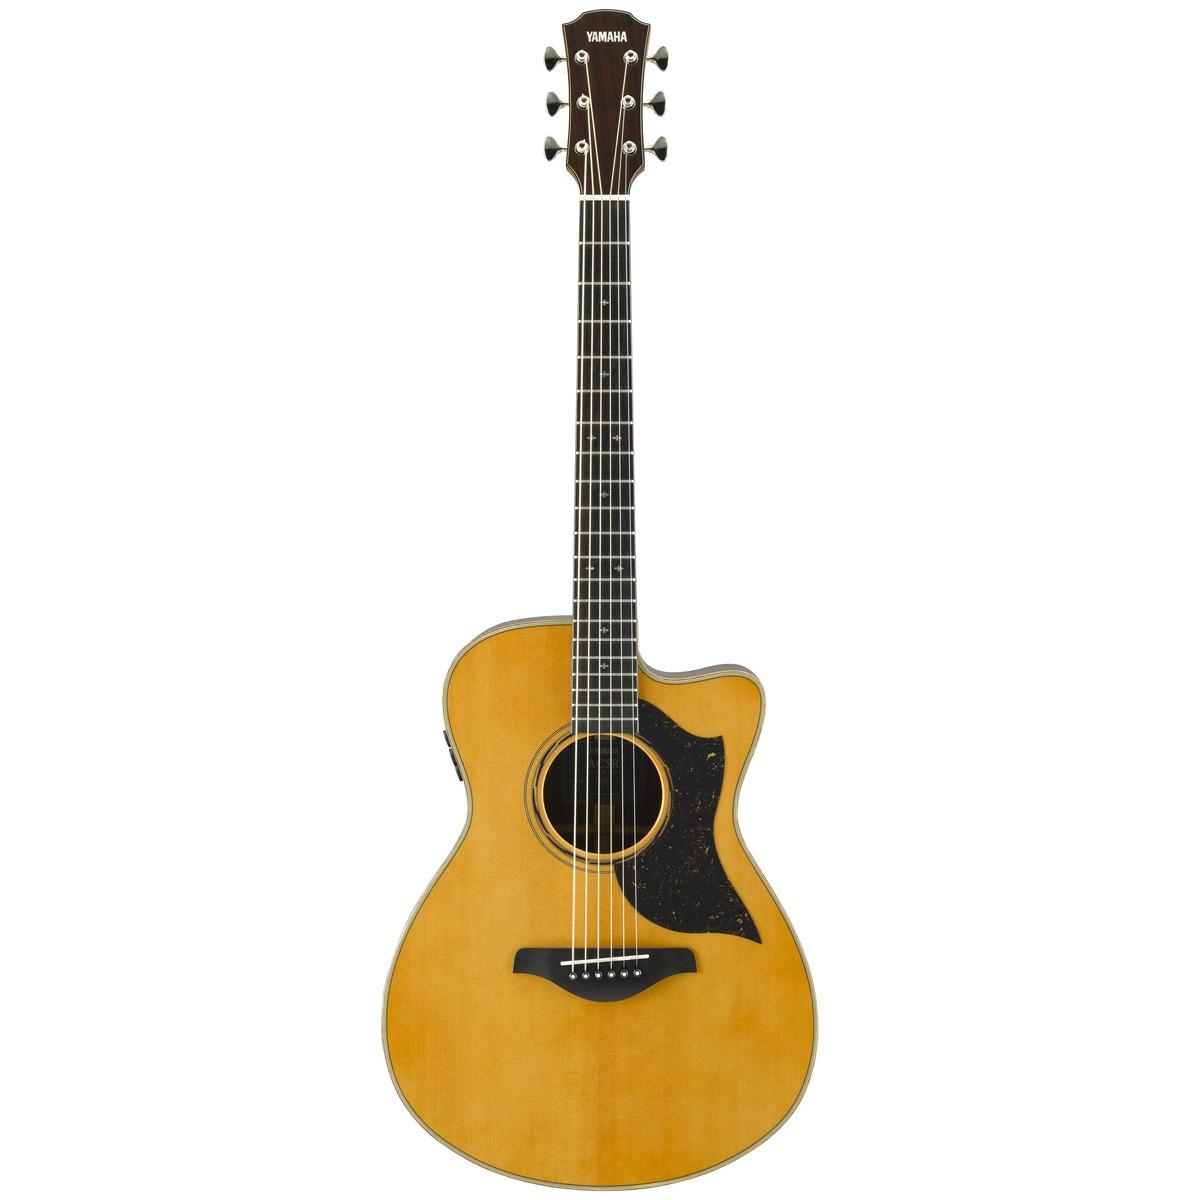 yamaha ac5r rosewood electro acoustic guitar vintage. Black Bedroom Furniture Sets. Home Design Ideas